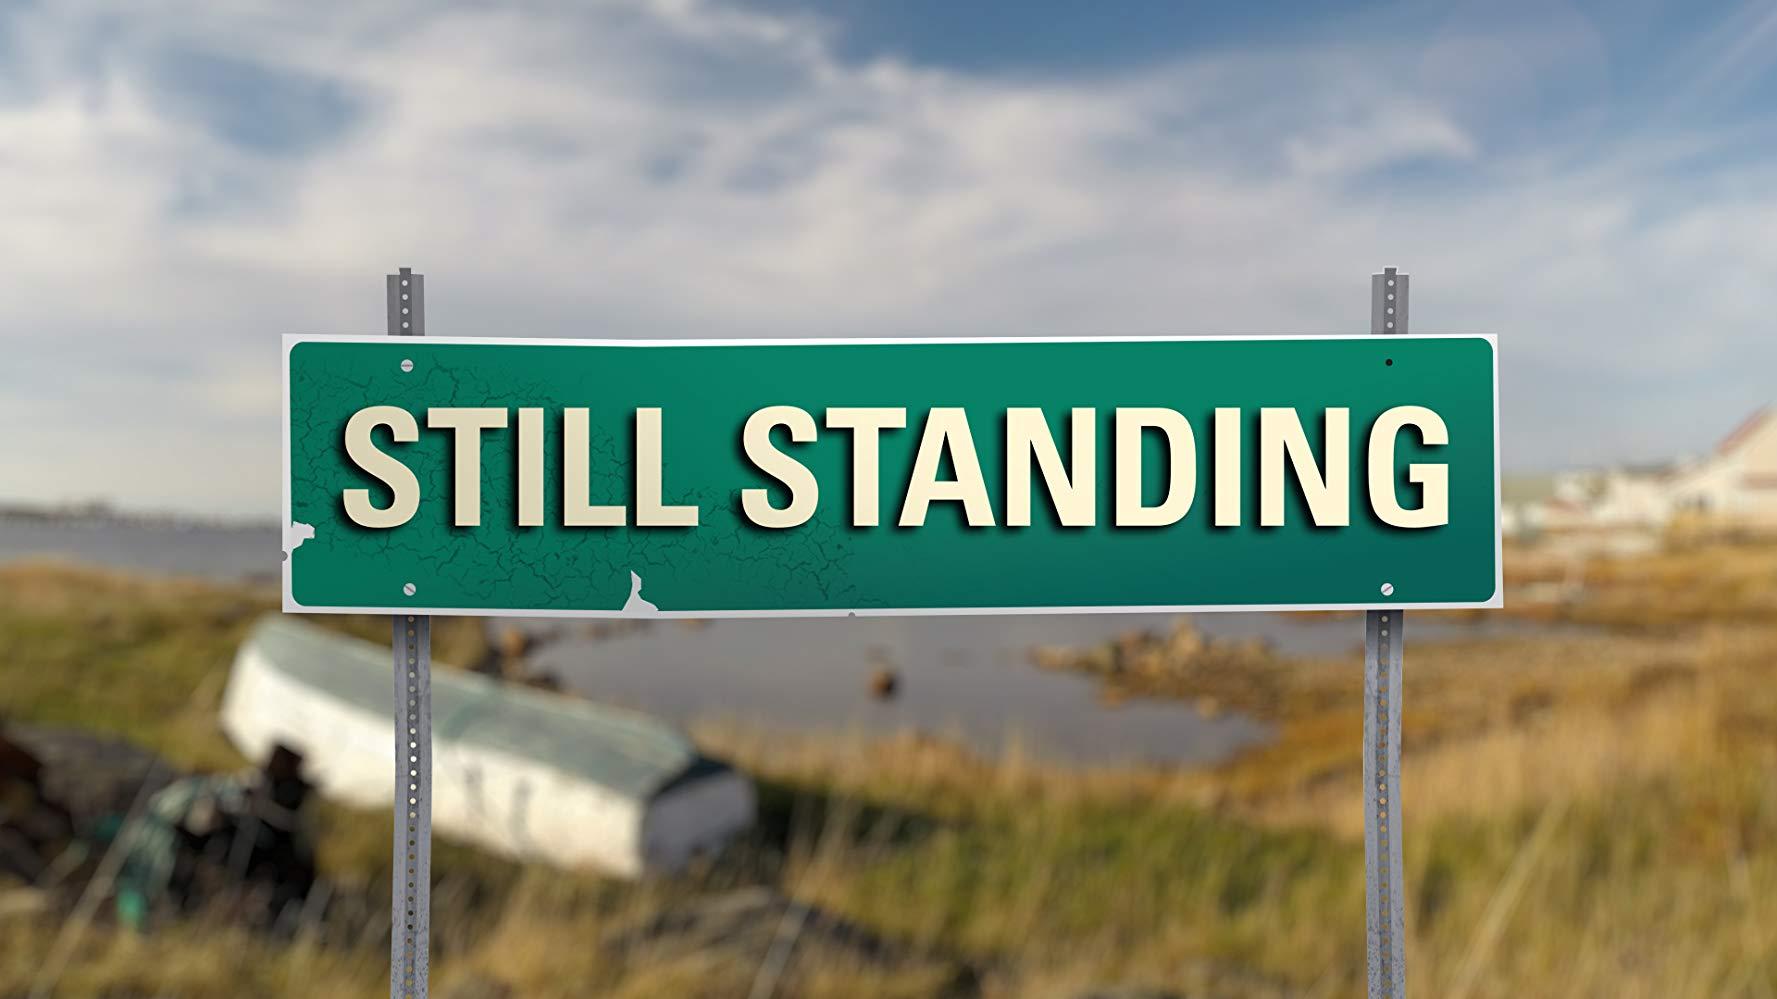 Still Standing 2015 S04E06 New Denmark WEBRip x264-KOMPOST